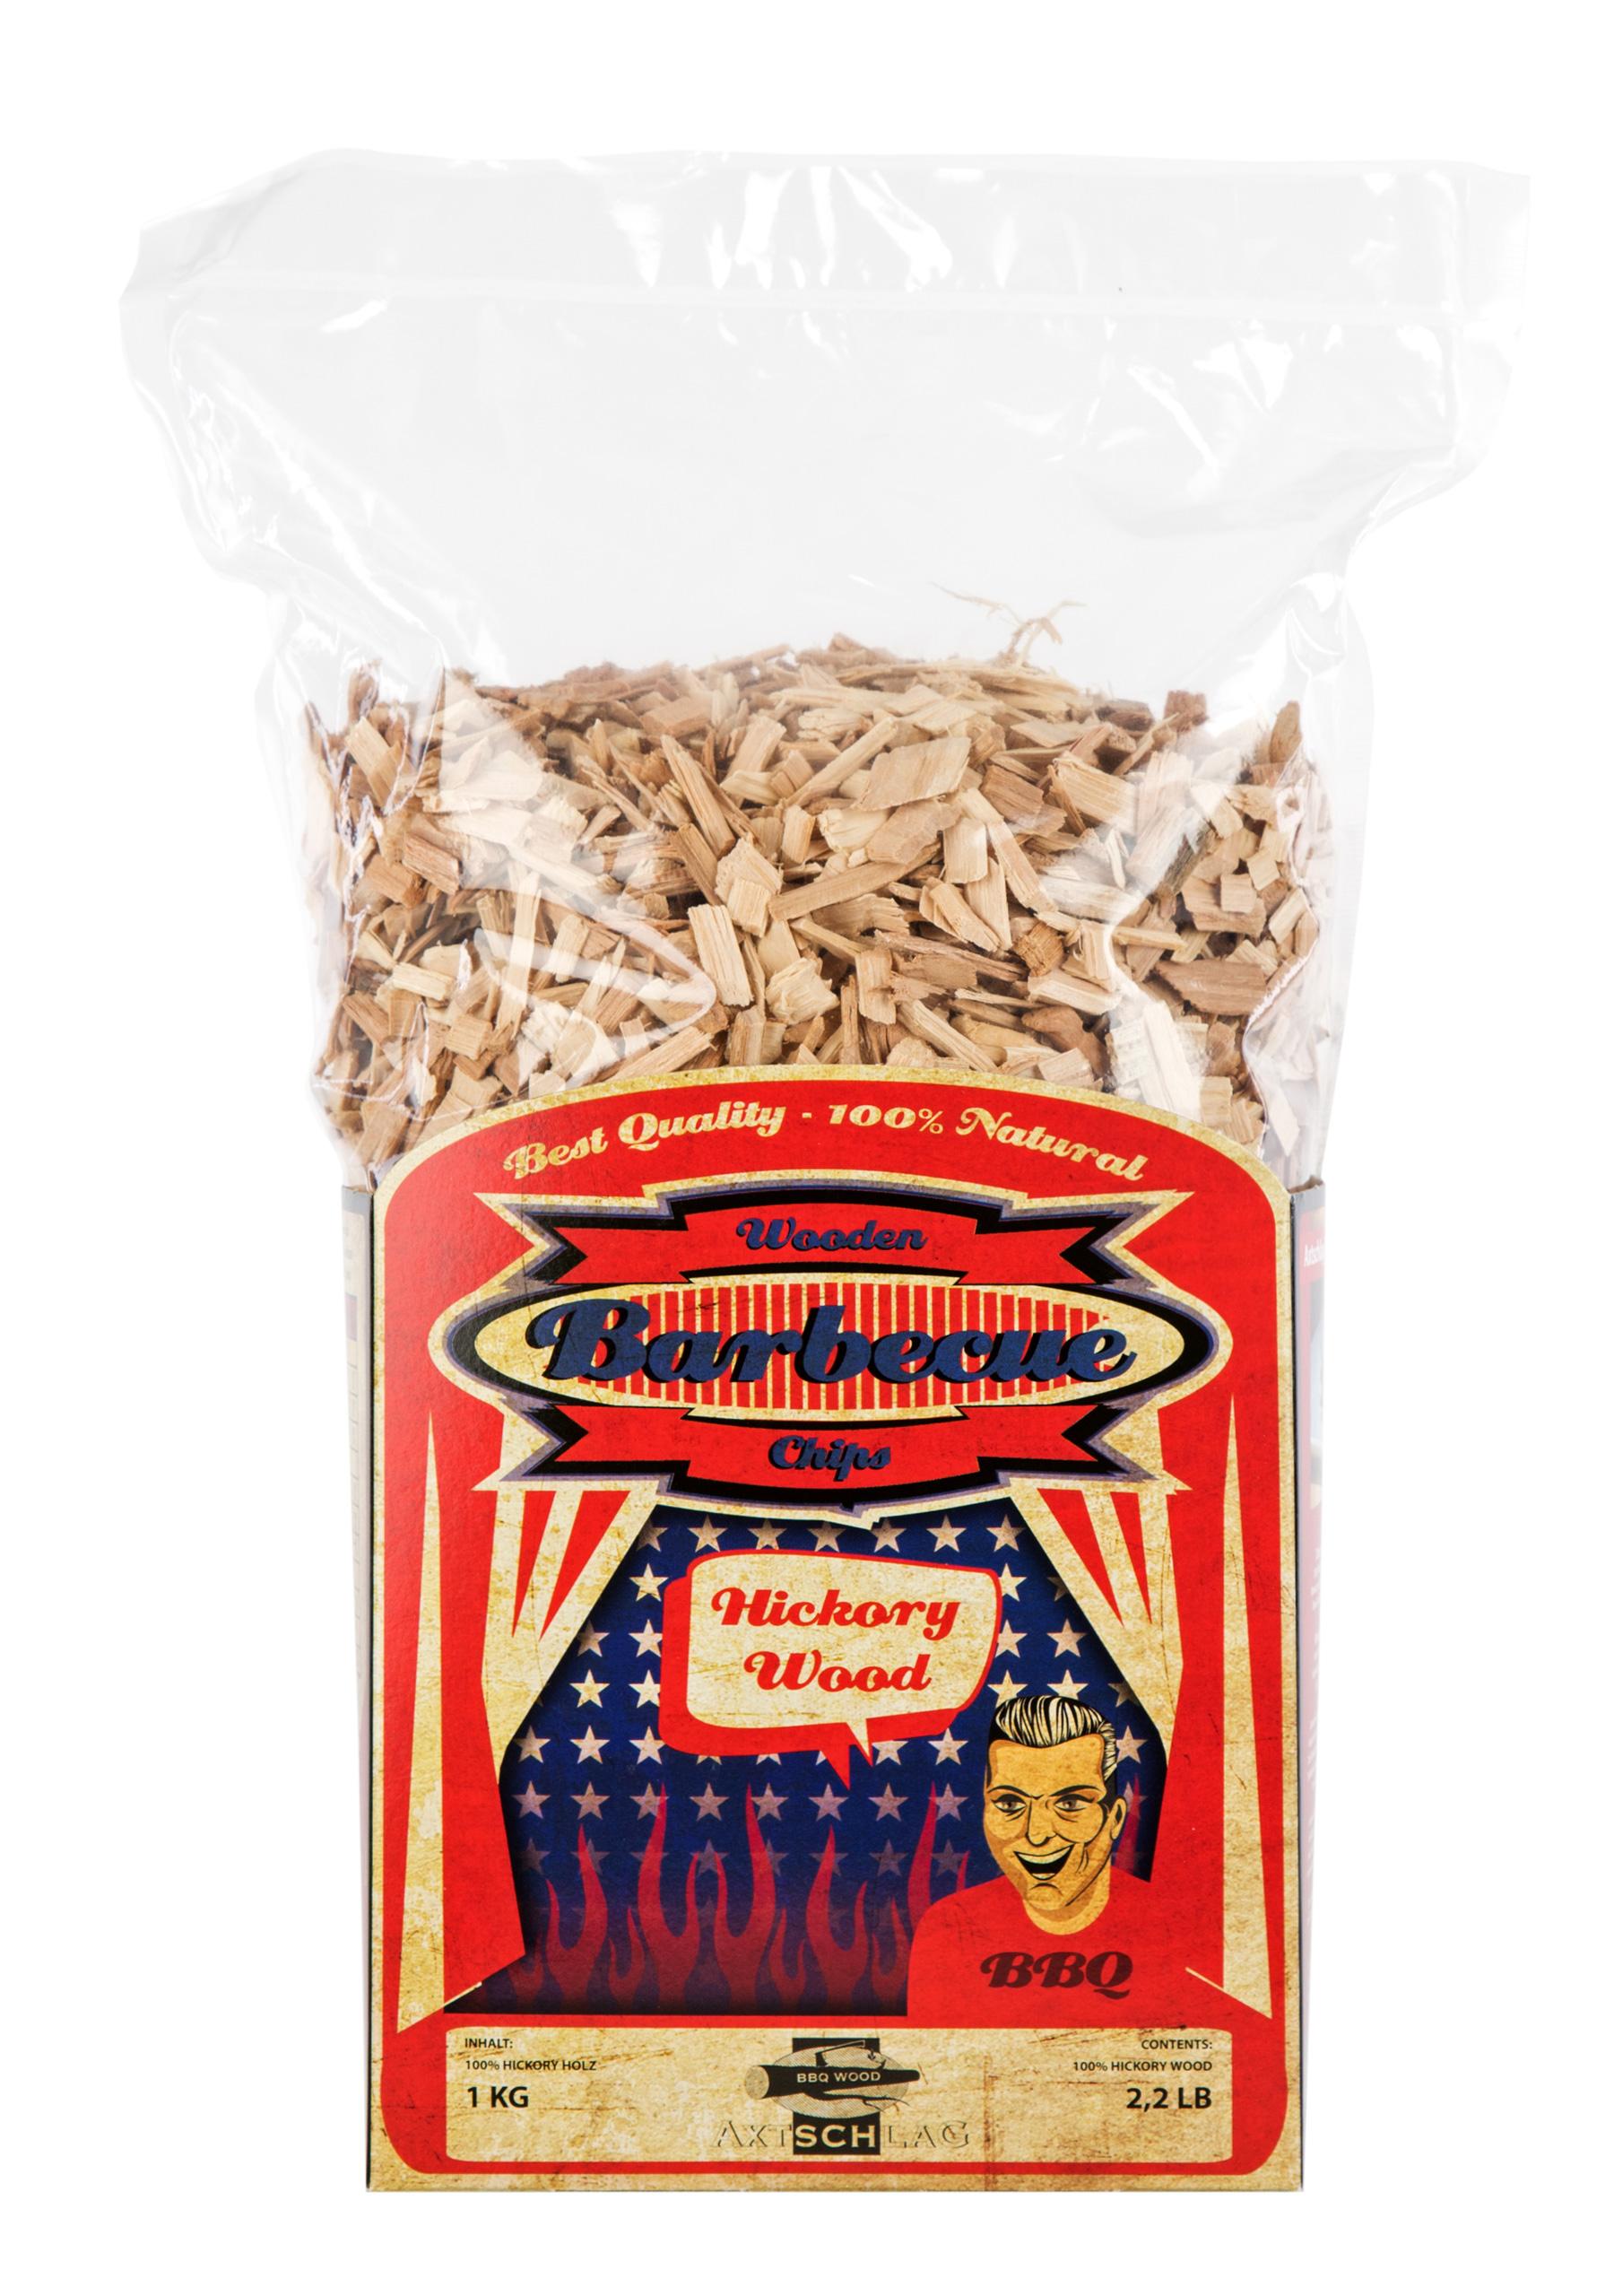 Axtschlag Räucherholz - Wood Smoking Chips - Hickory